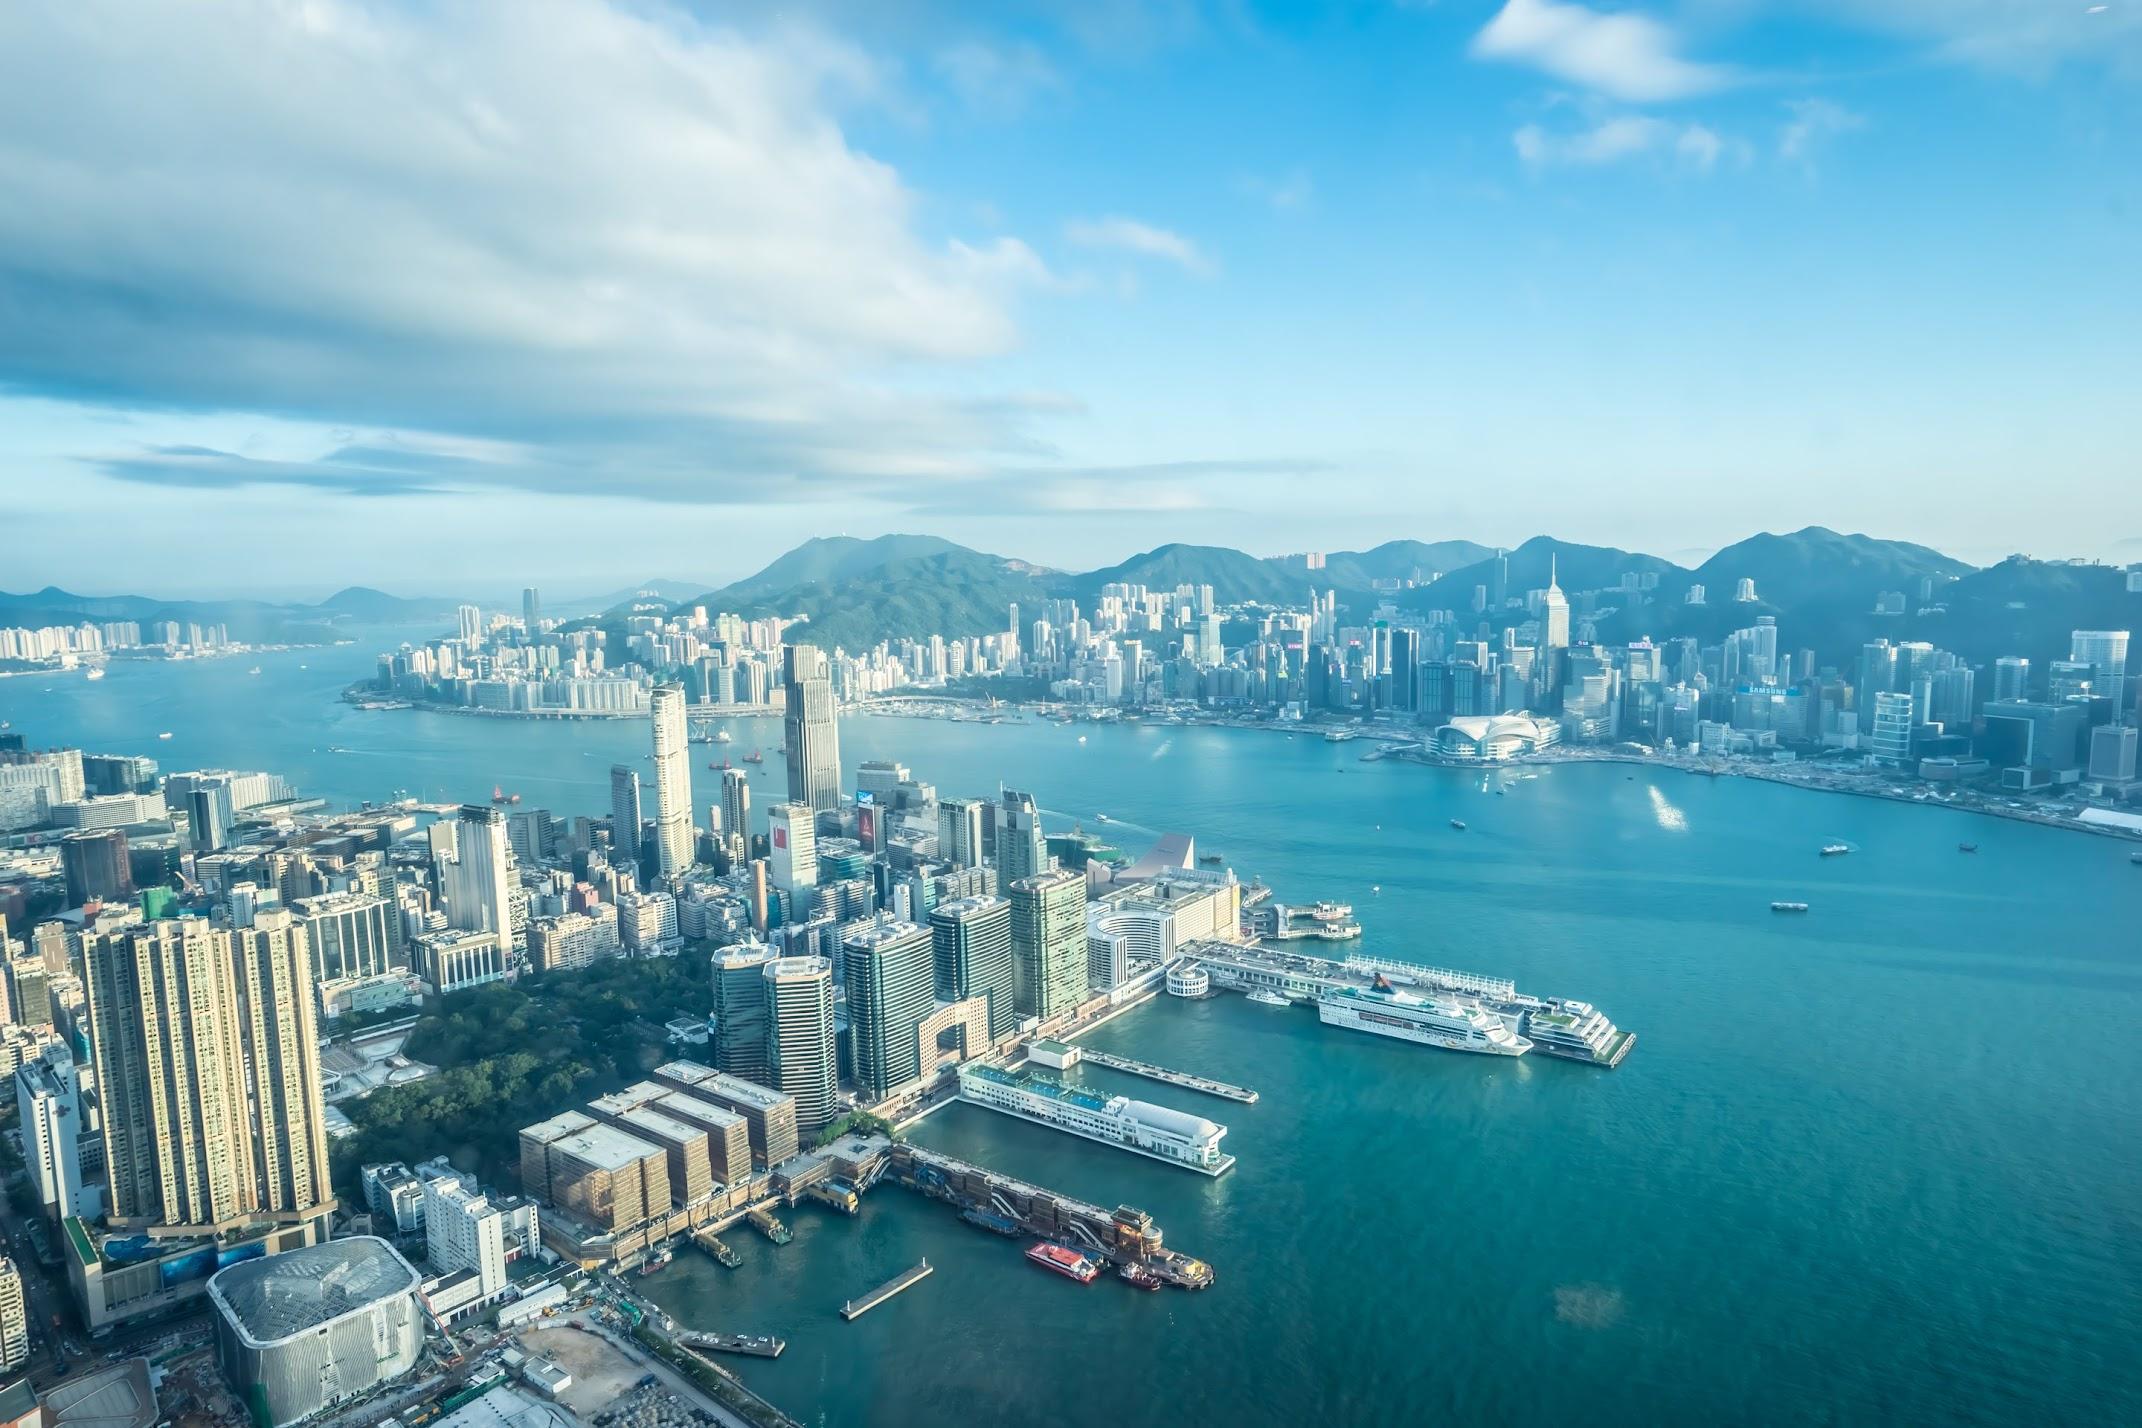 Hong Kong sky100 (天際100)5